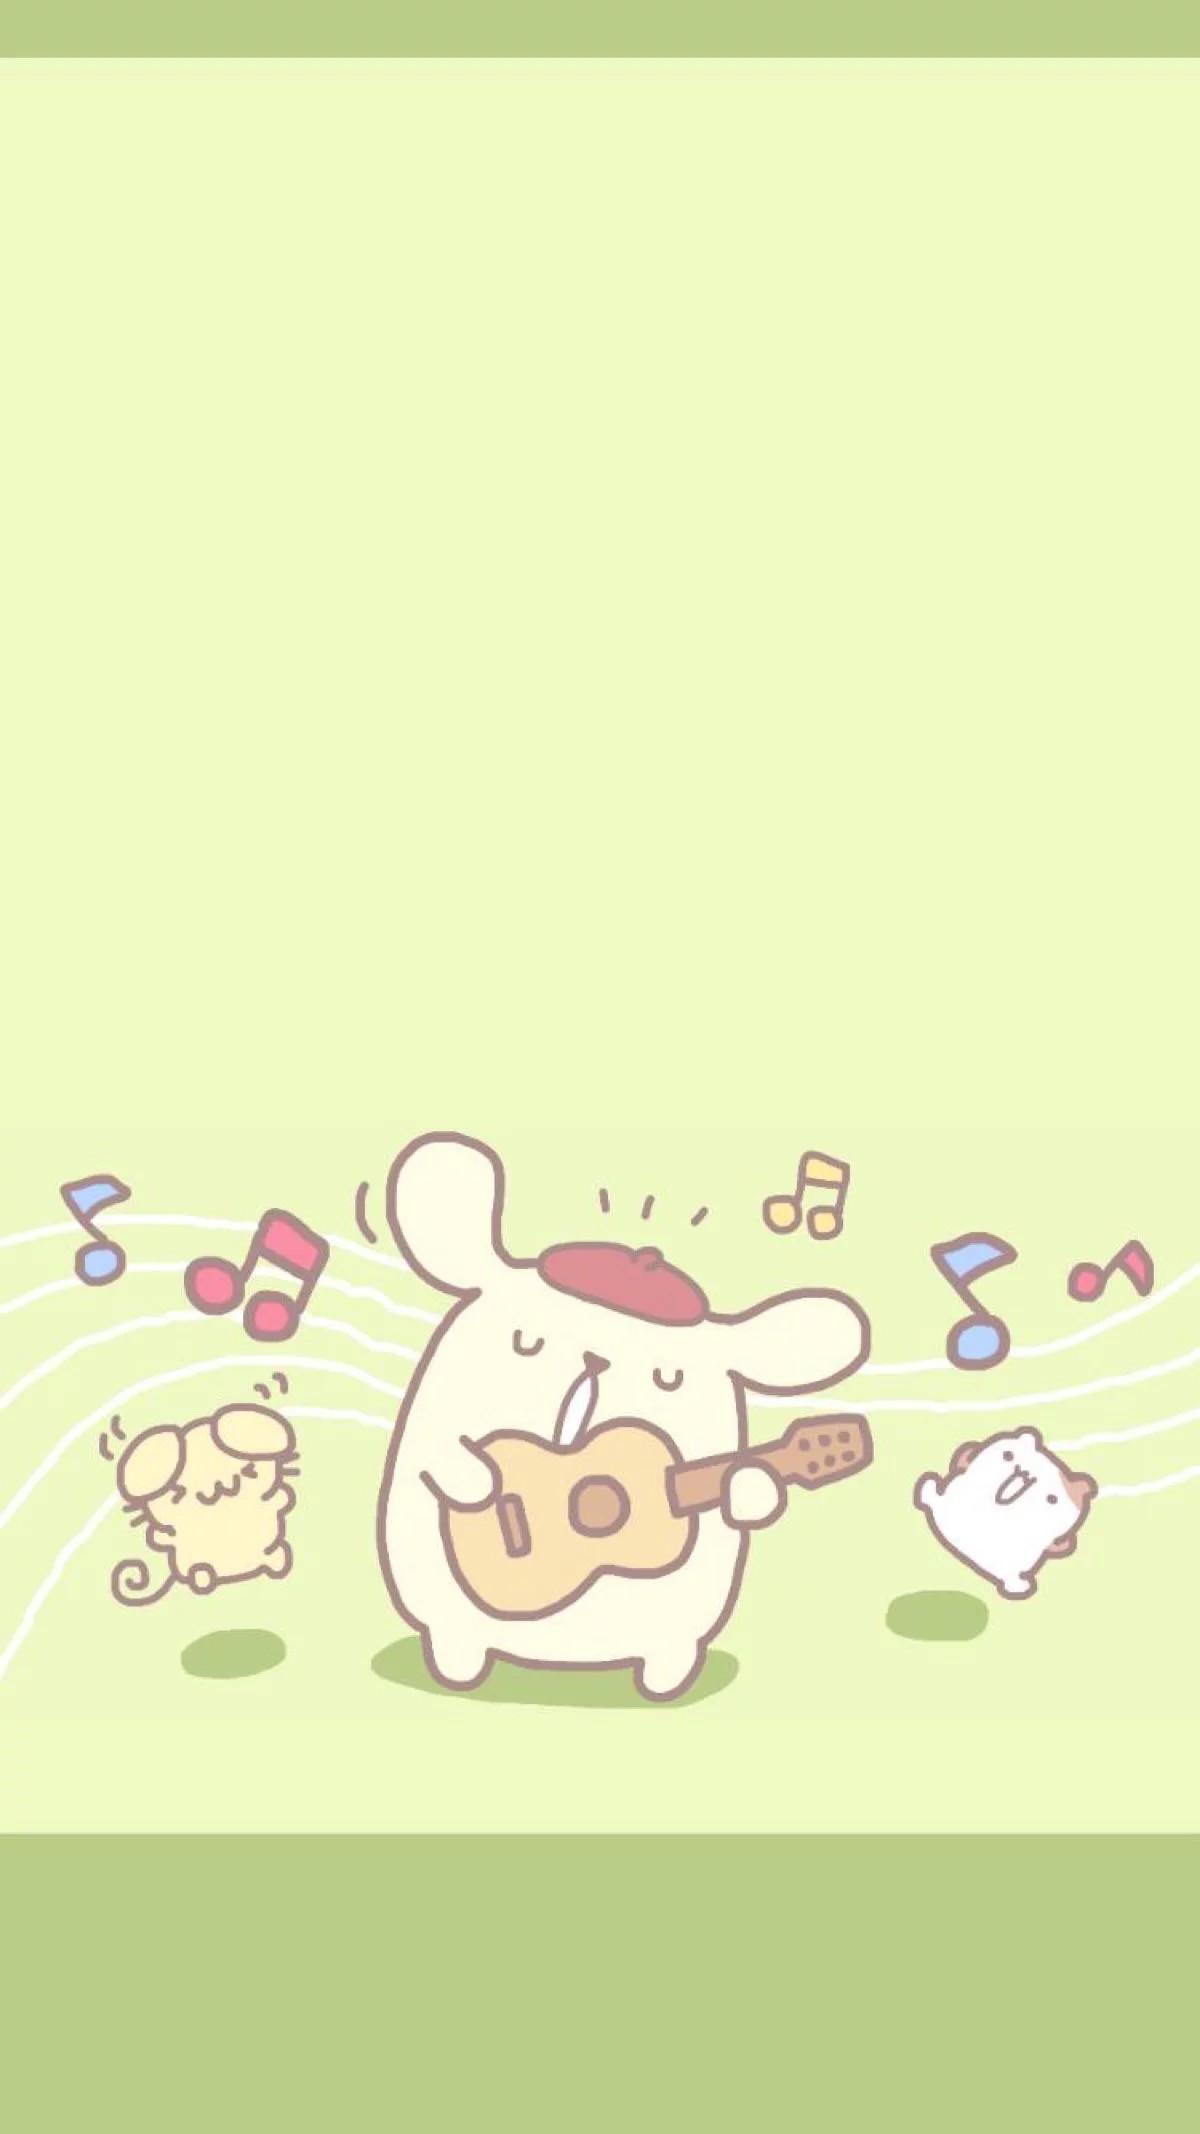 Cute Wallpaper Rilakkuma Sanrio Pom Pom Purin And Macaron Wallpaper 183 ① Wallpapertag